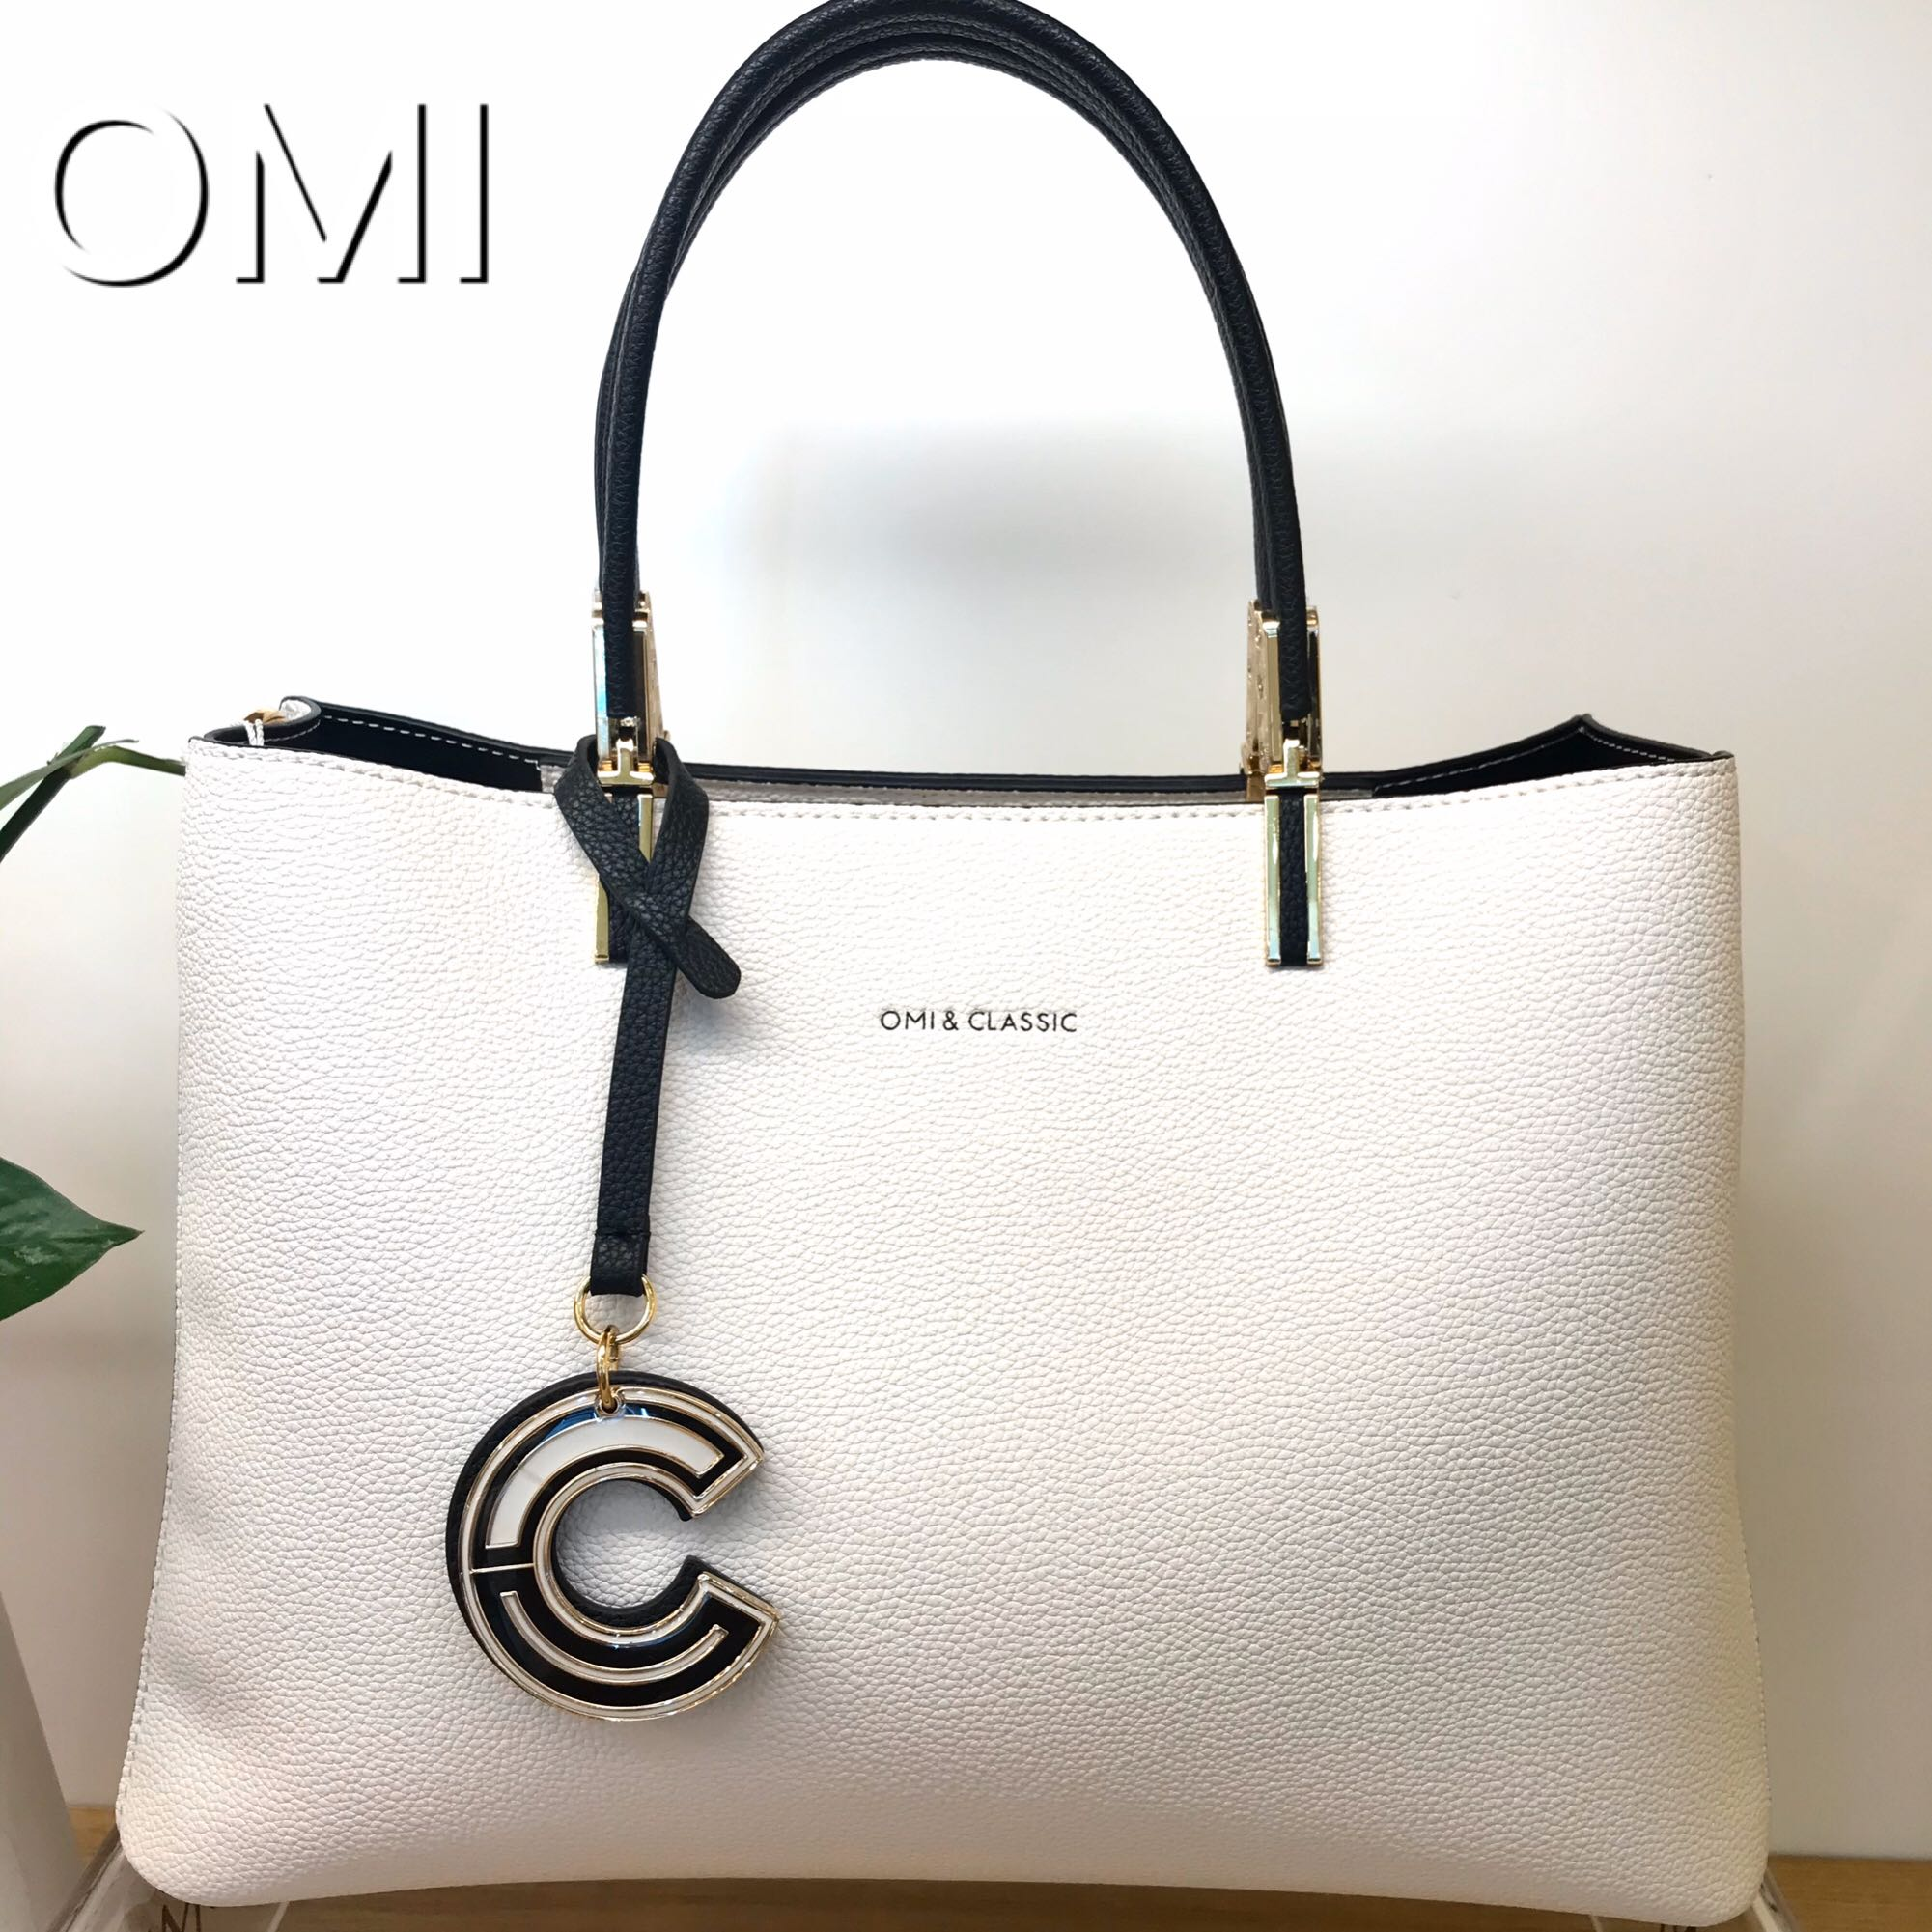 OMI Omi Omi Omi Ug純白バッグファッションシンプルOL風シリーズ高級感牛革ショルダーショルダー